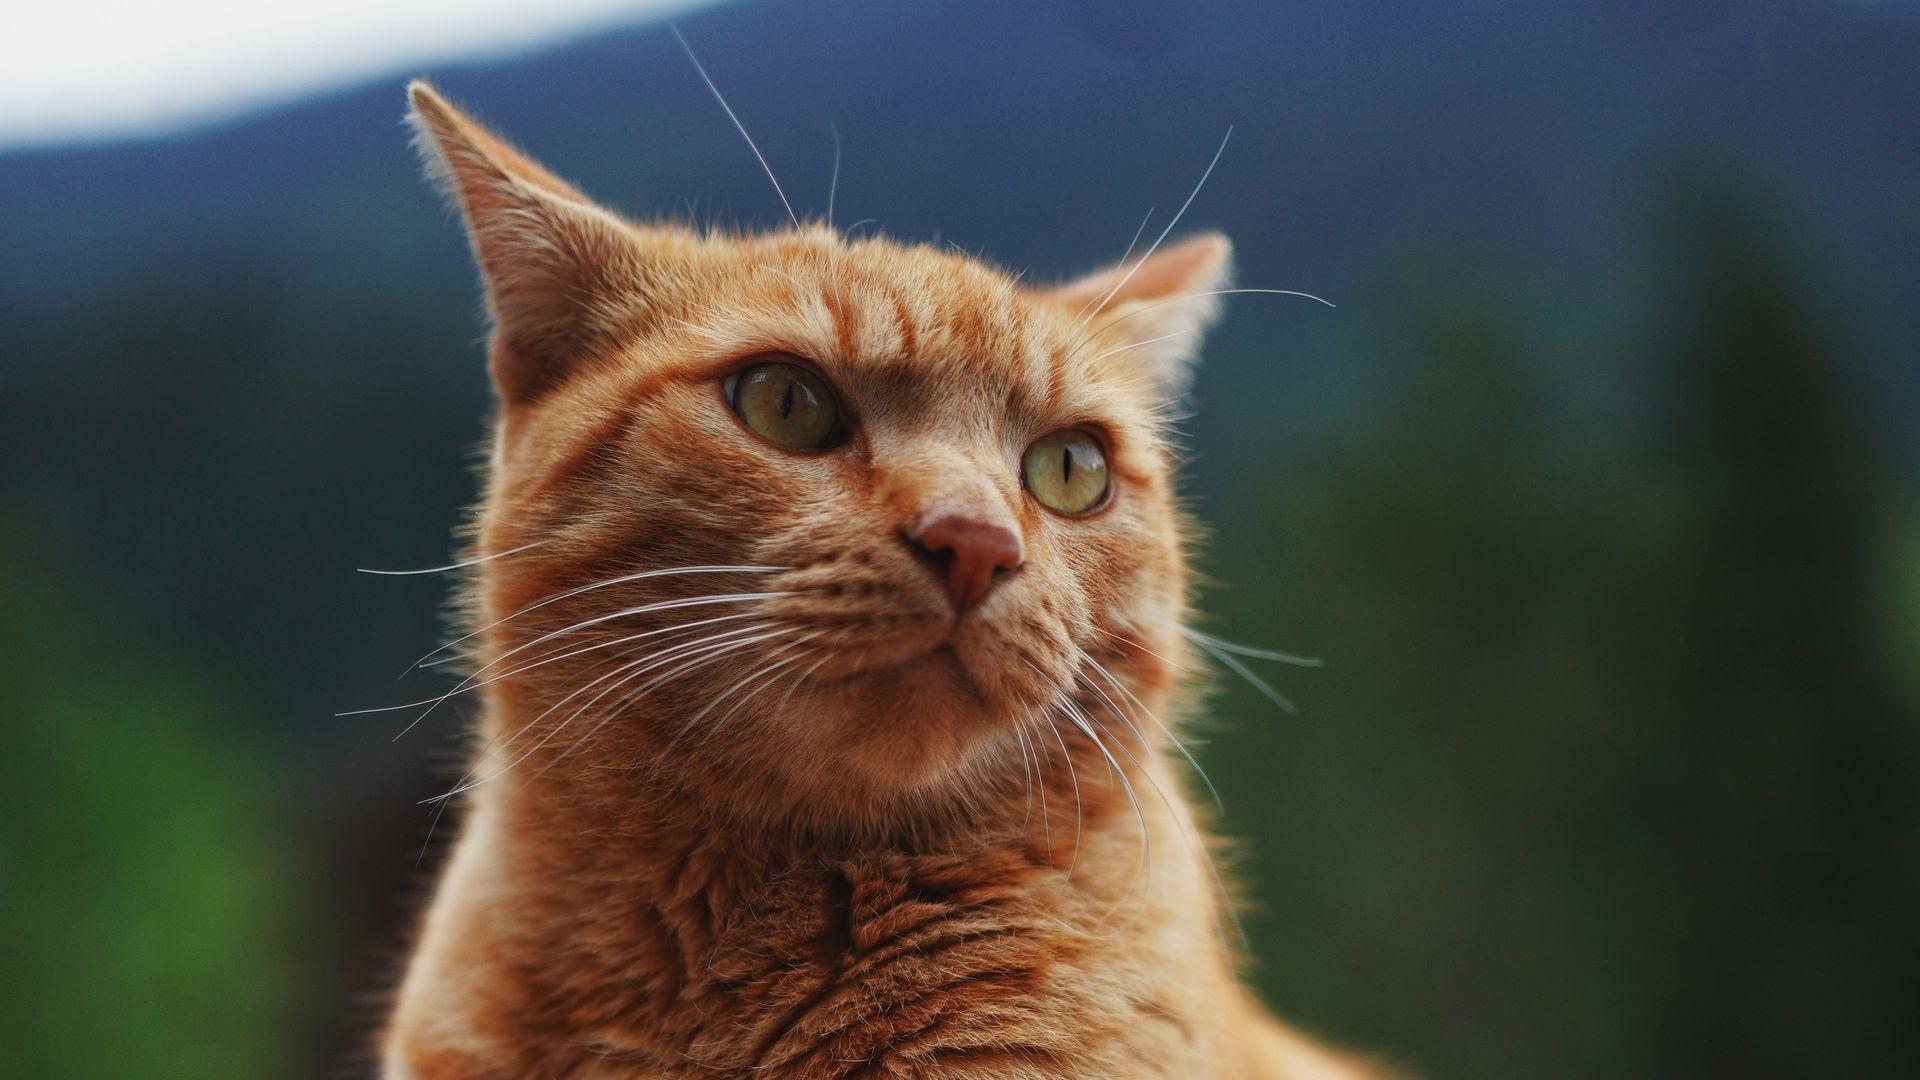 Ginger Cat HD Wallpaper